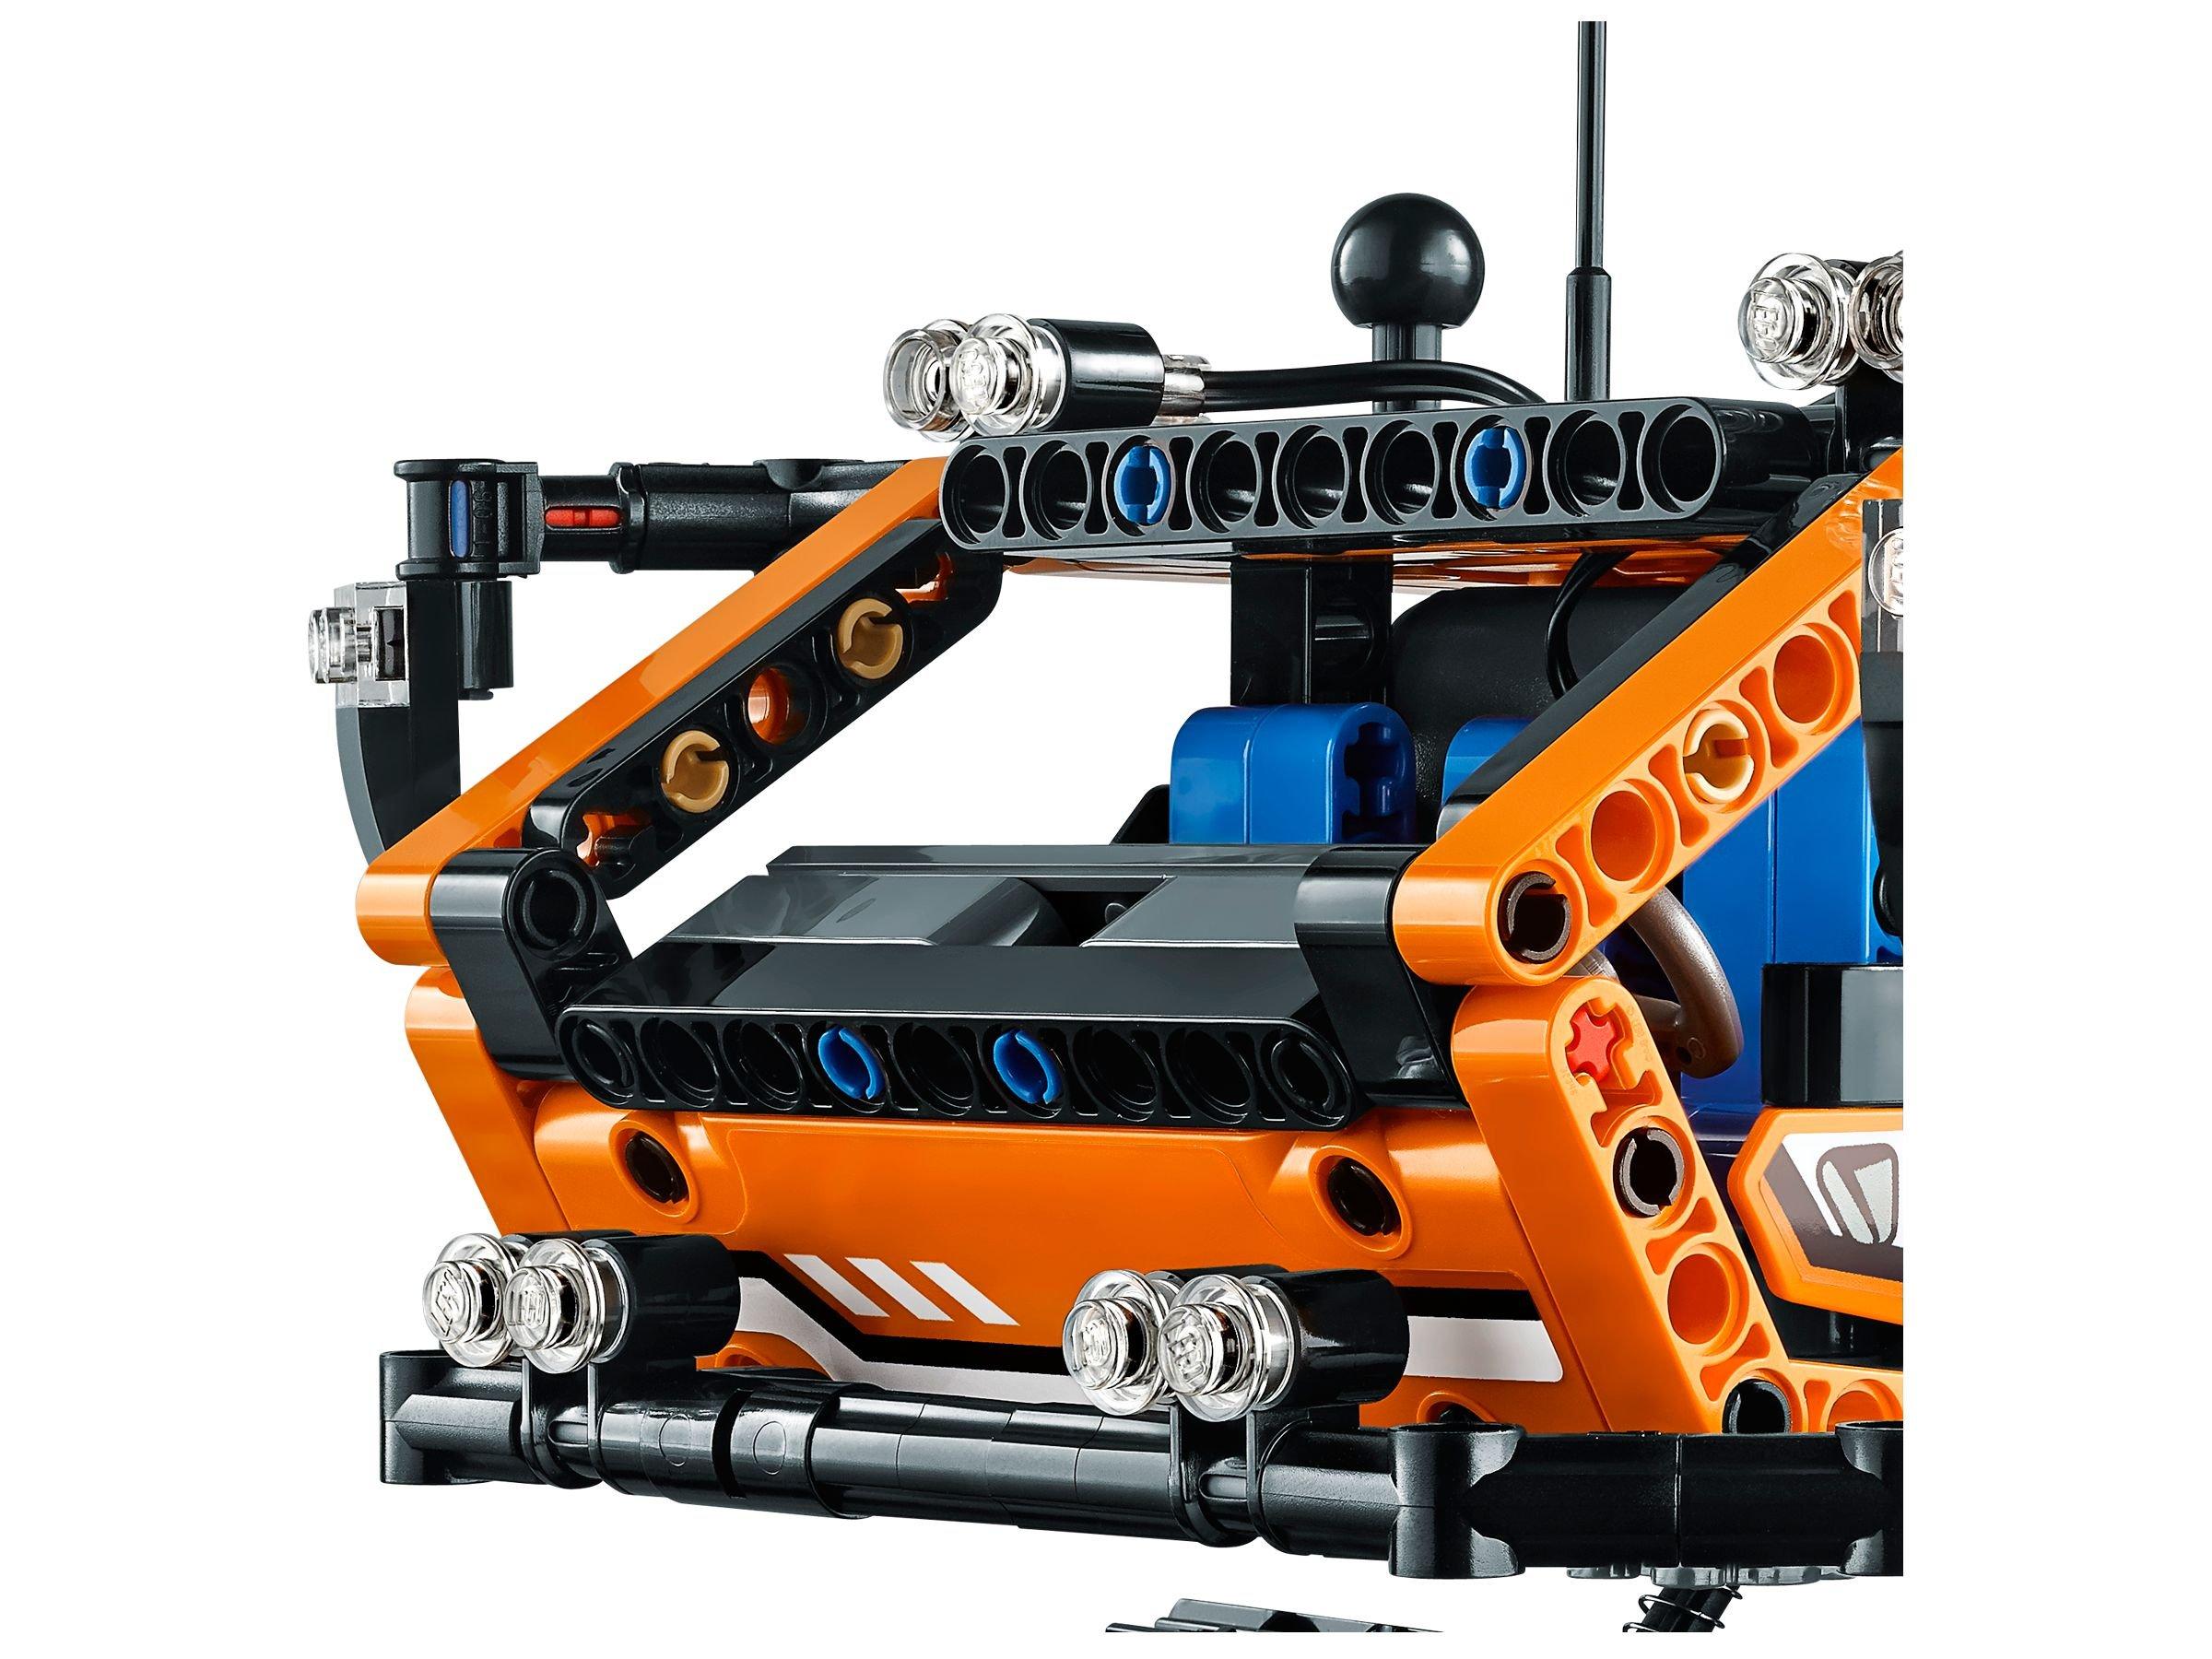 arktis kettenfahrzeug 42038 lego technic 2015 im. Black Bedroom Furniture Sets. Home Design Ideas